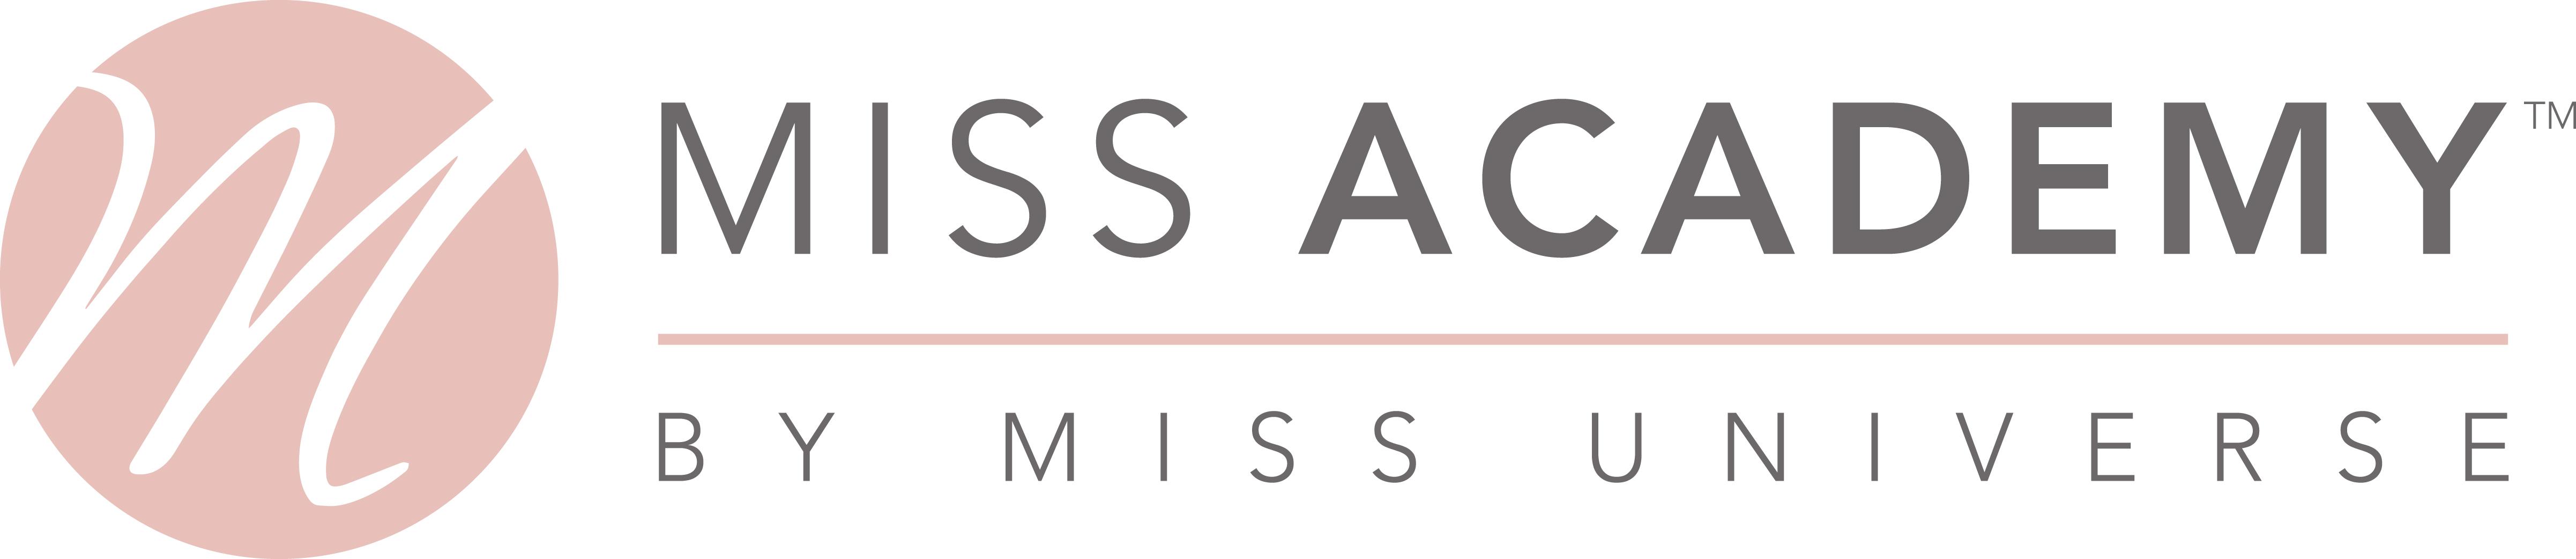 LOGO_Miss_Academy_MissUniverse JPEG